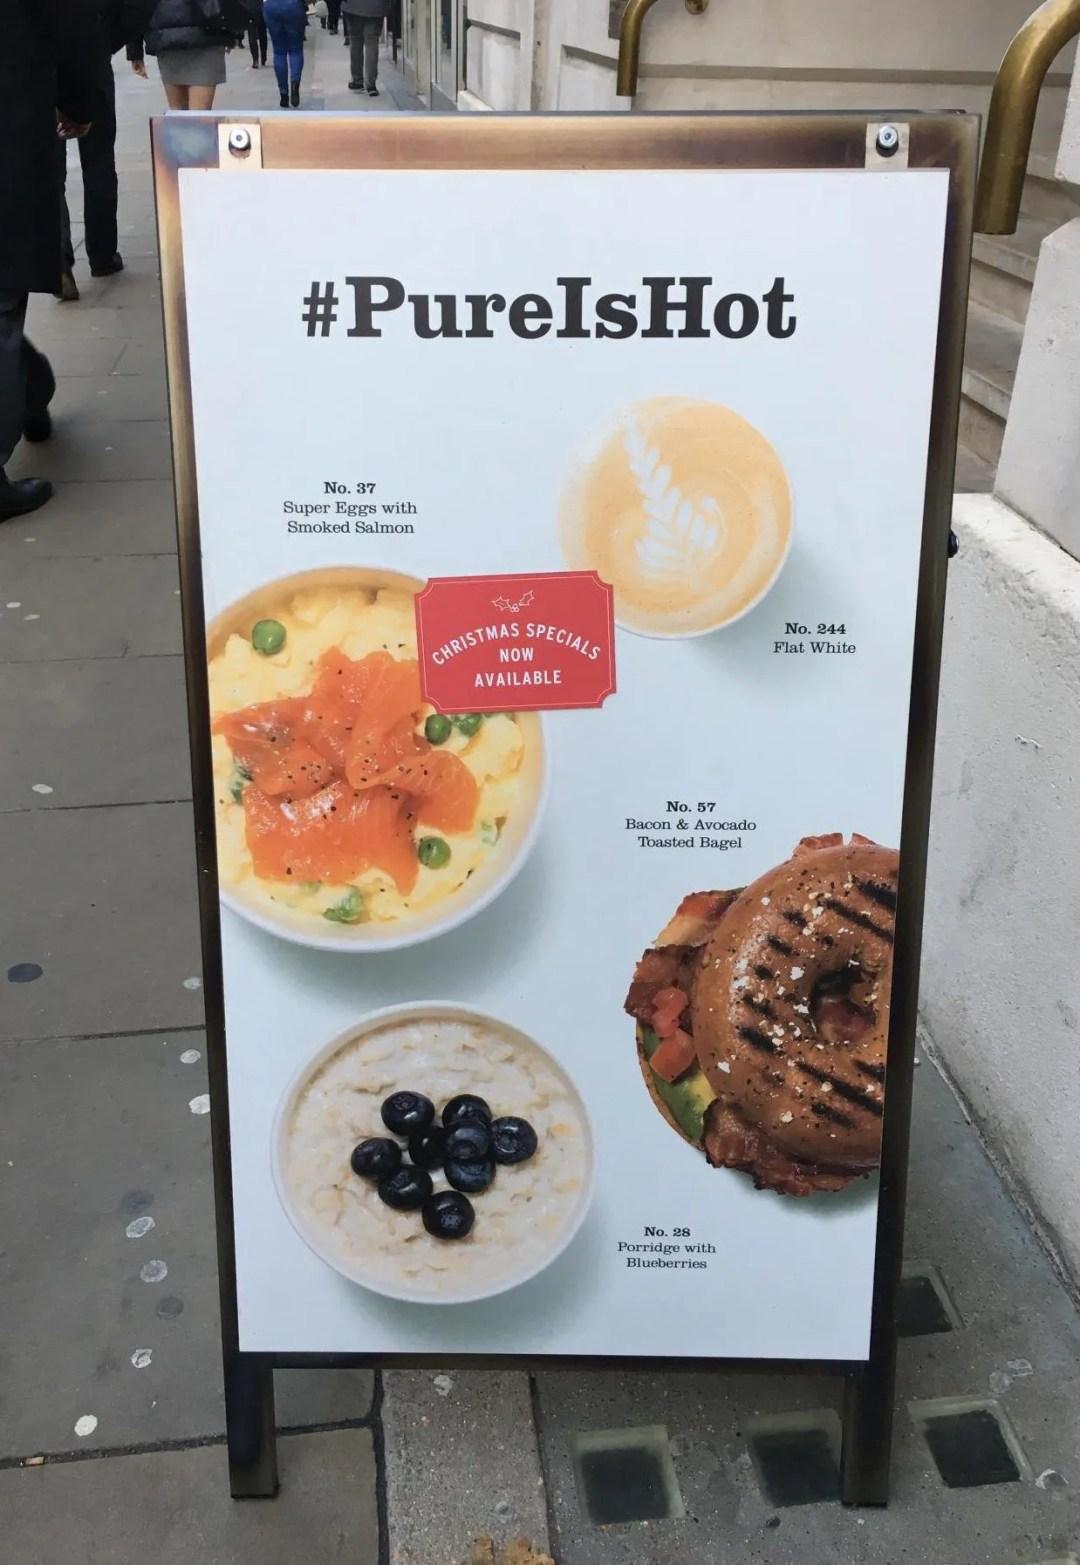 adventures of a gluten free globetrekker Gluten Free London Restaurant: Pure Gluten Free Travel UK London